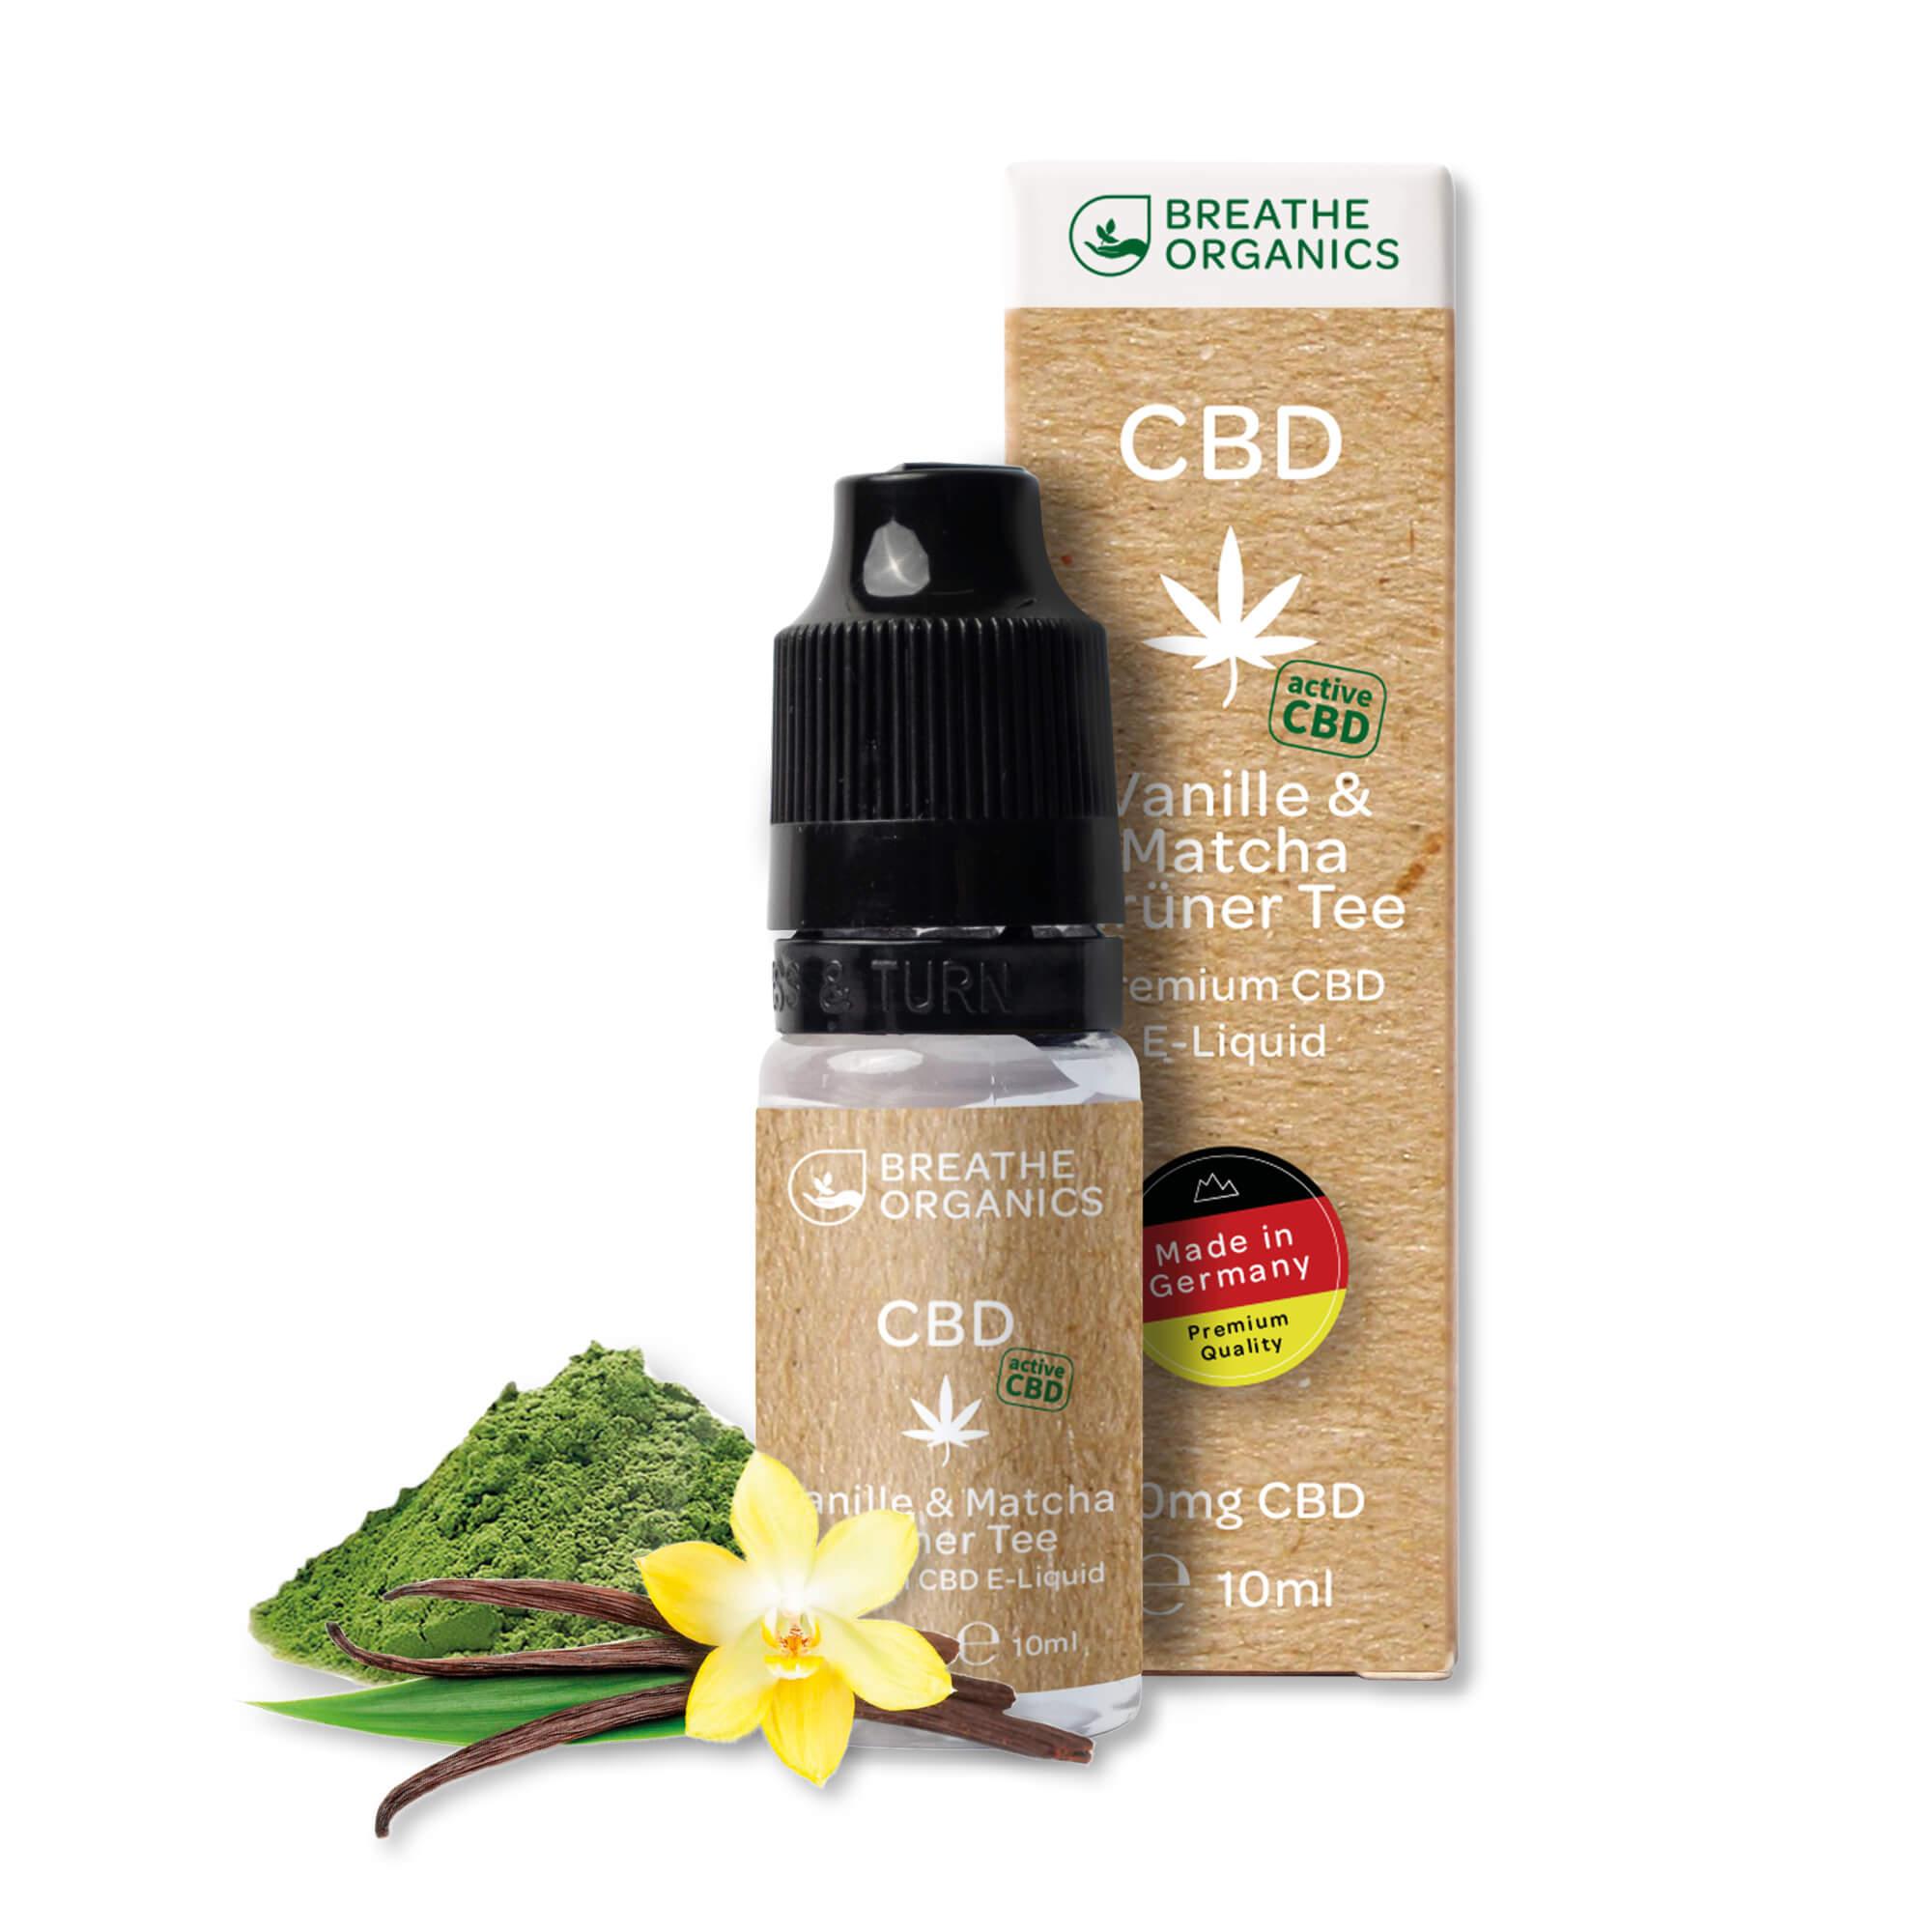 Breathe Organics - activeCBD Liquid Vanille & Matcha Grüner Tee 30mg